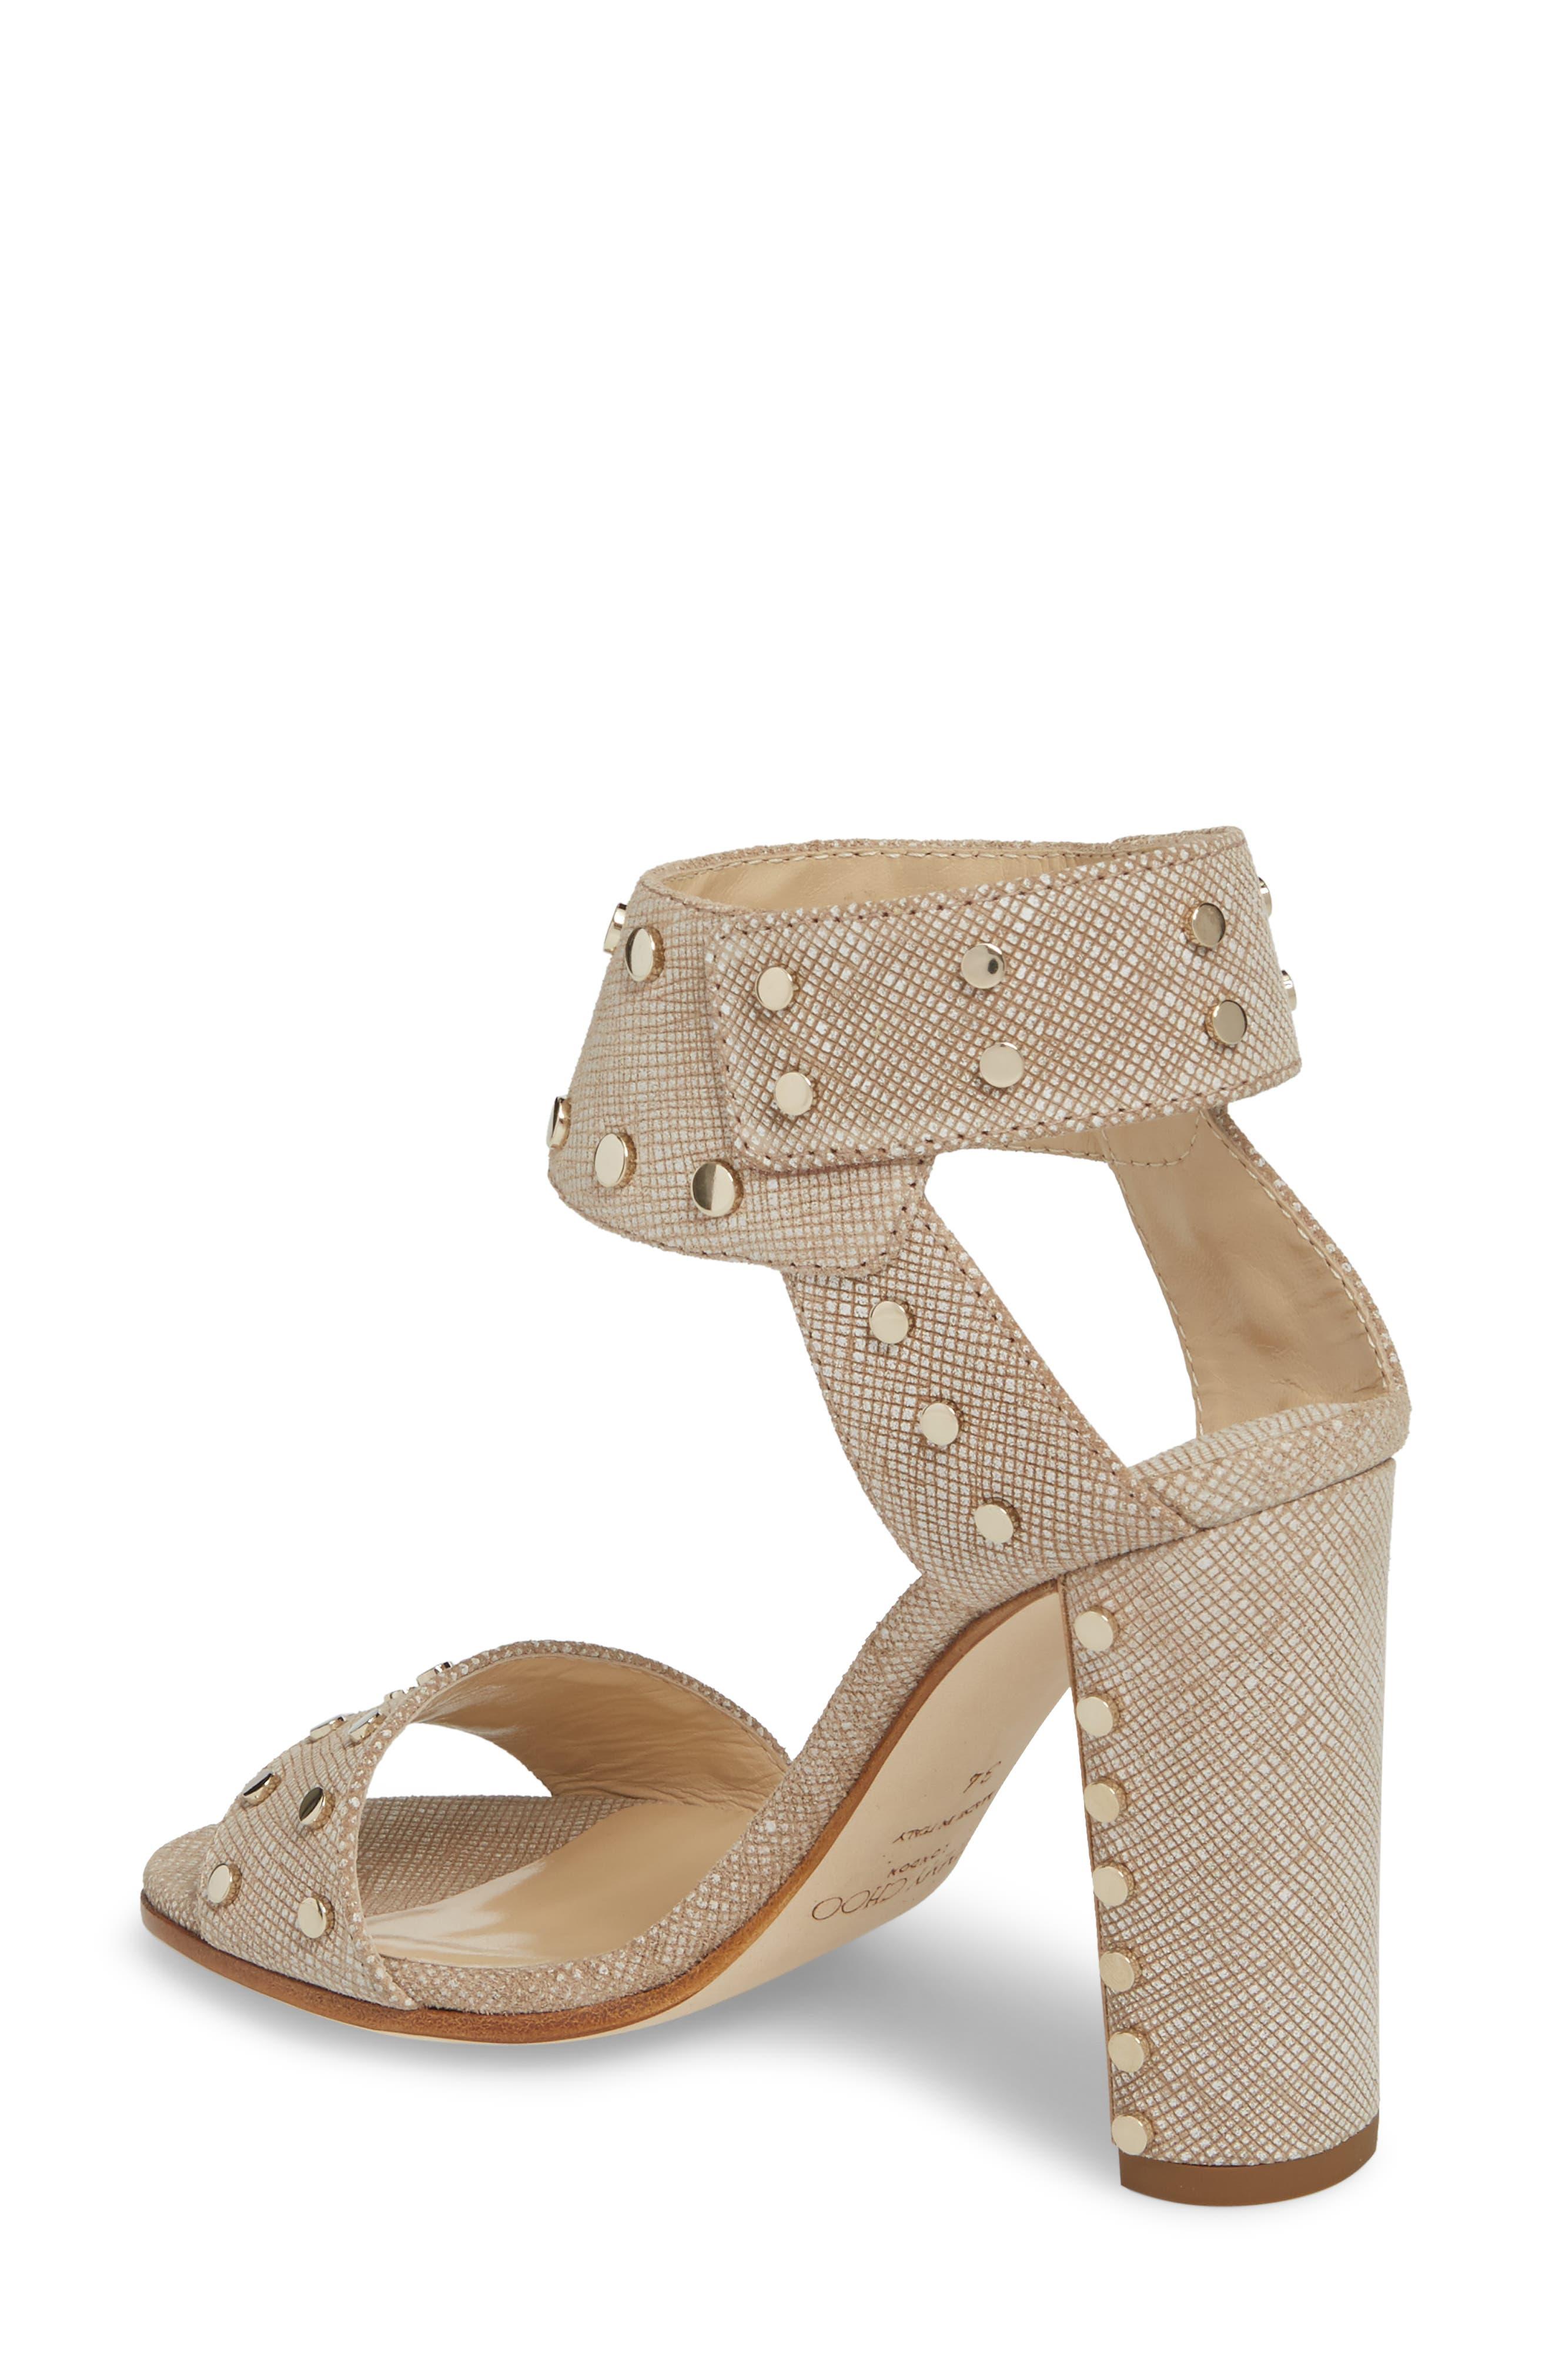 Alternate Image 2  - Jimmy Choo Veto Studded Ankle Cuff Sandal (Women)